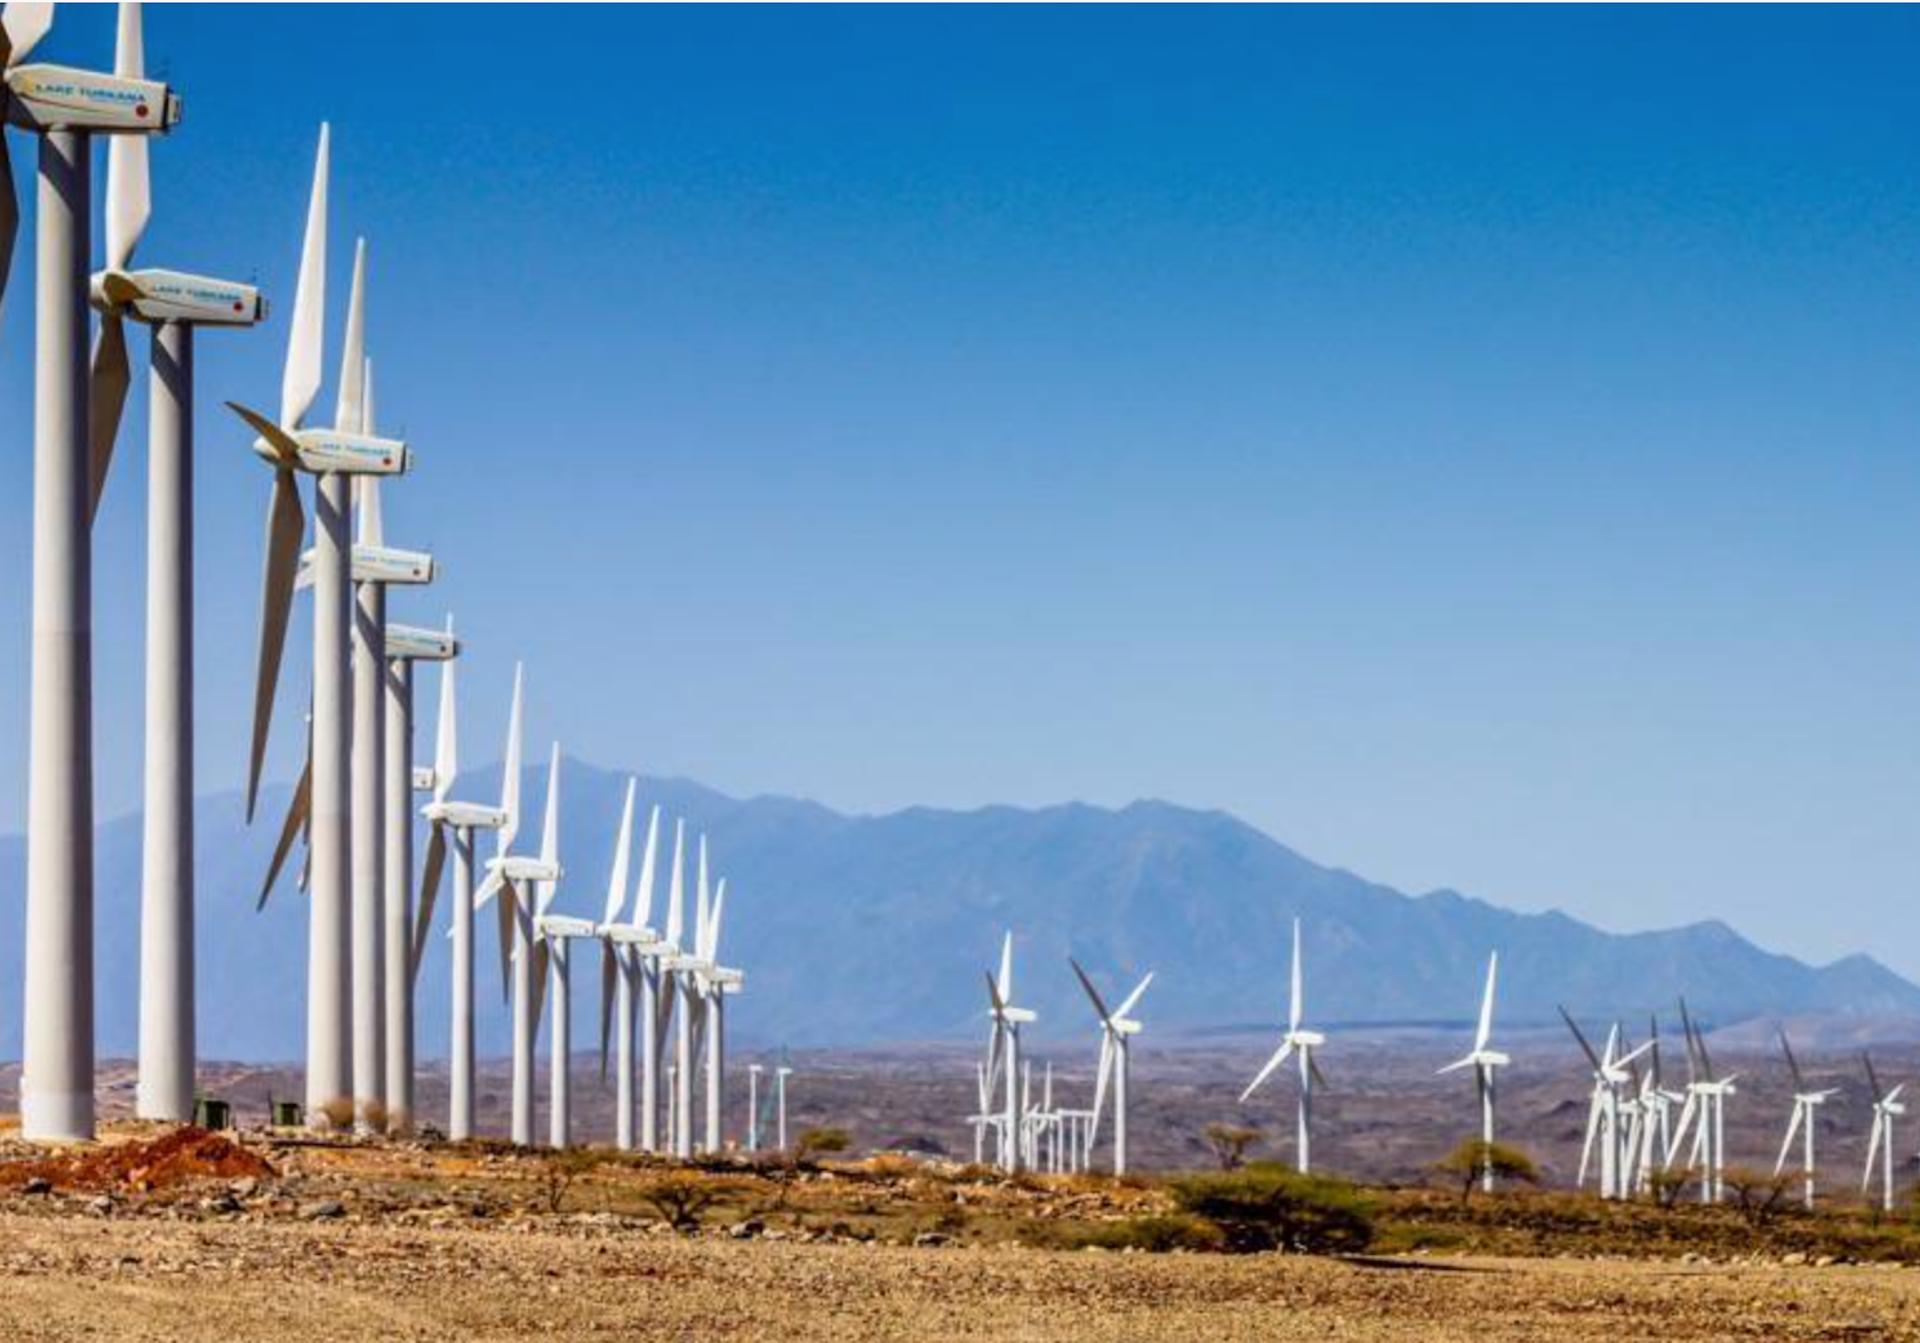 How Kenya's Mega Wind Power Project Is Hurting Communities